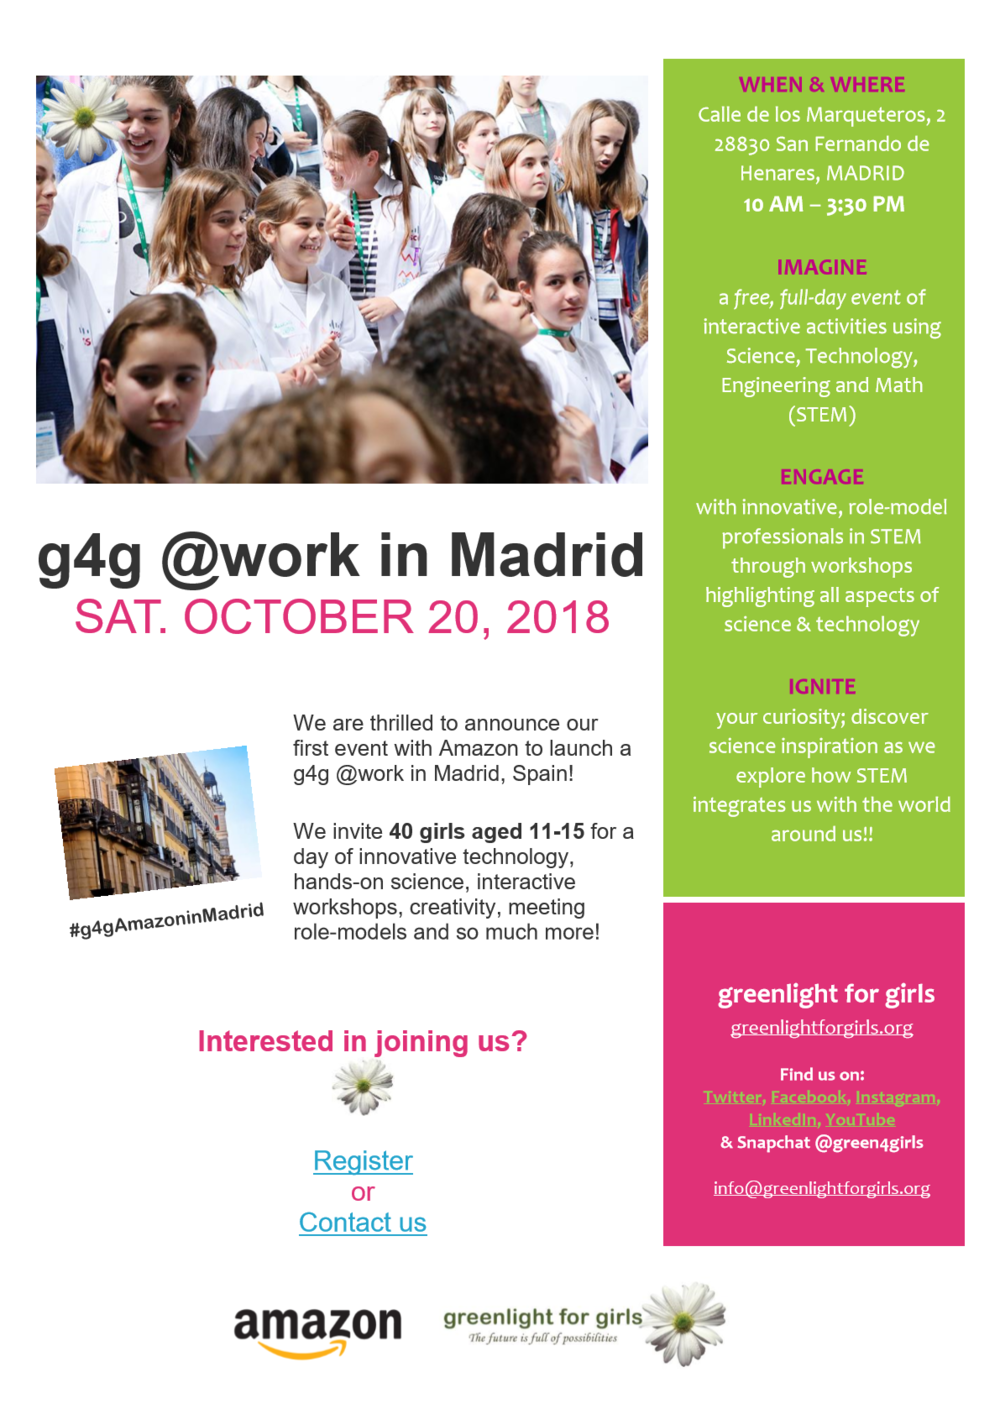 g4g @work in Madrid